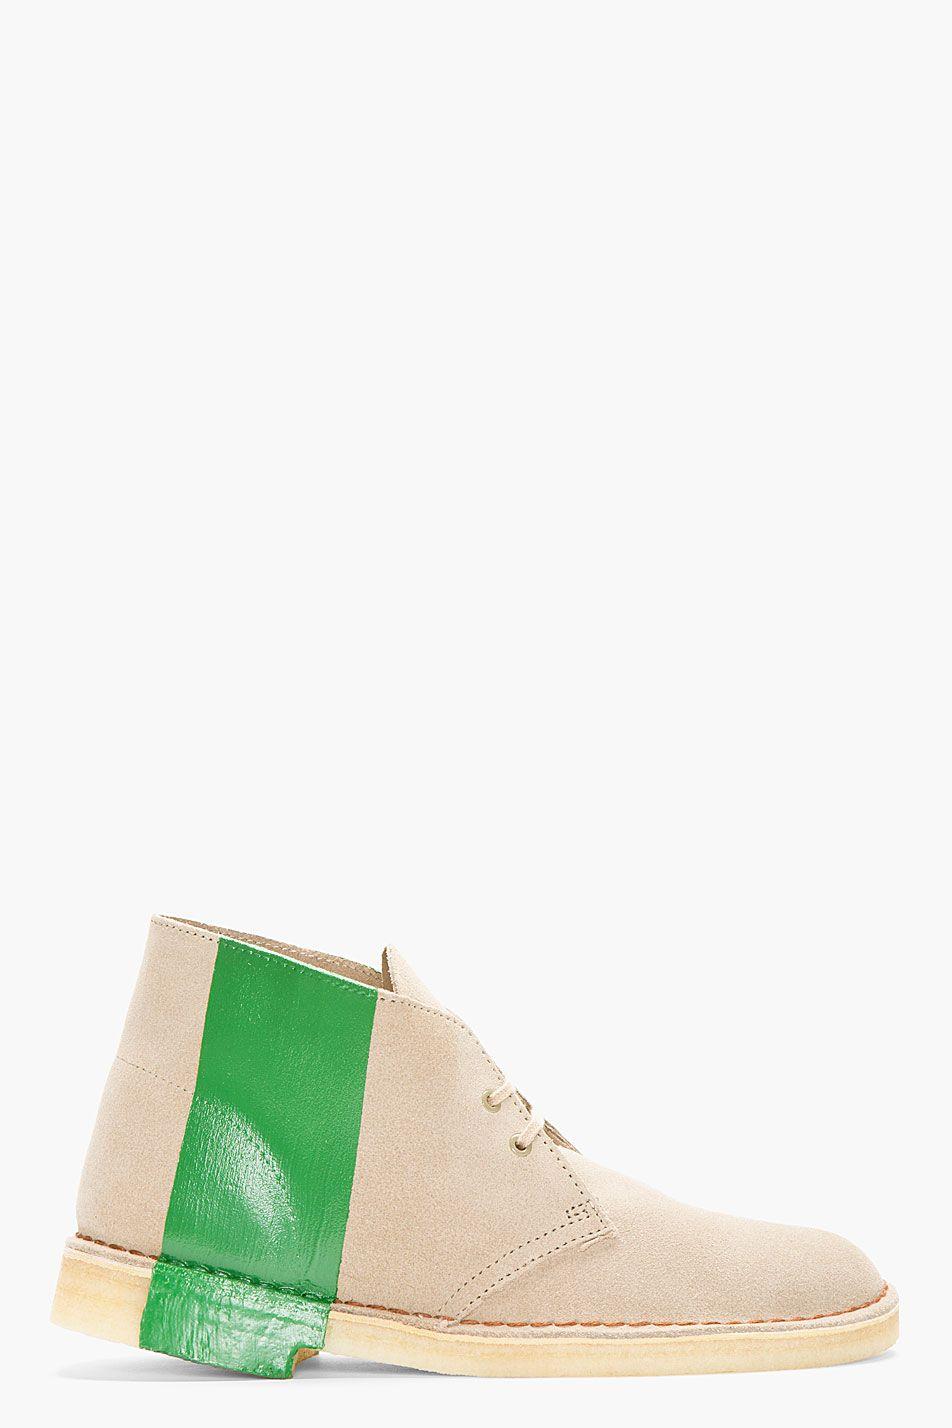 aea681e276dbd8 SACAI Beige Striped Chukka Boots